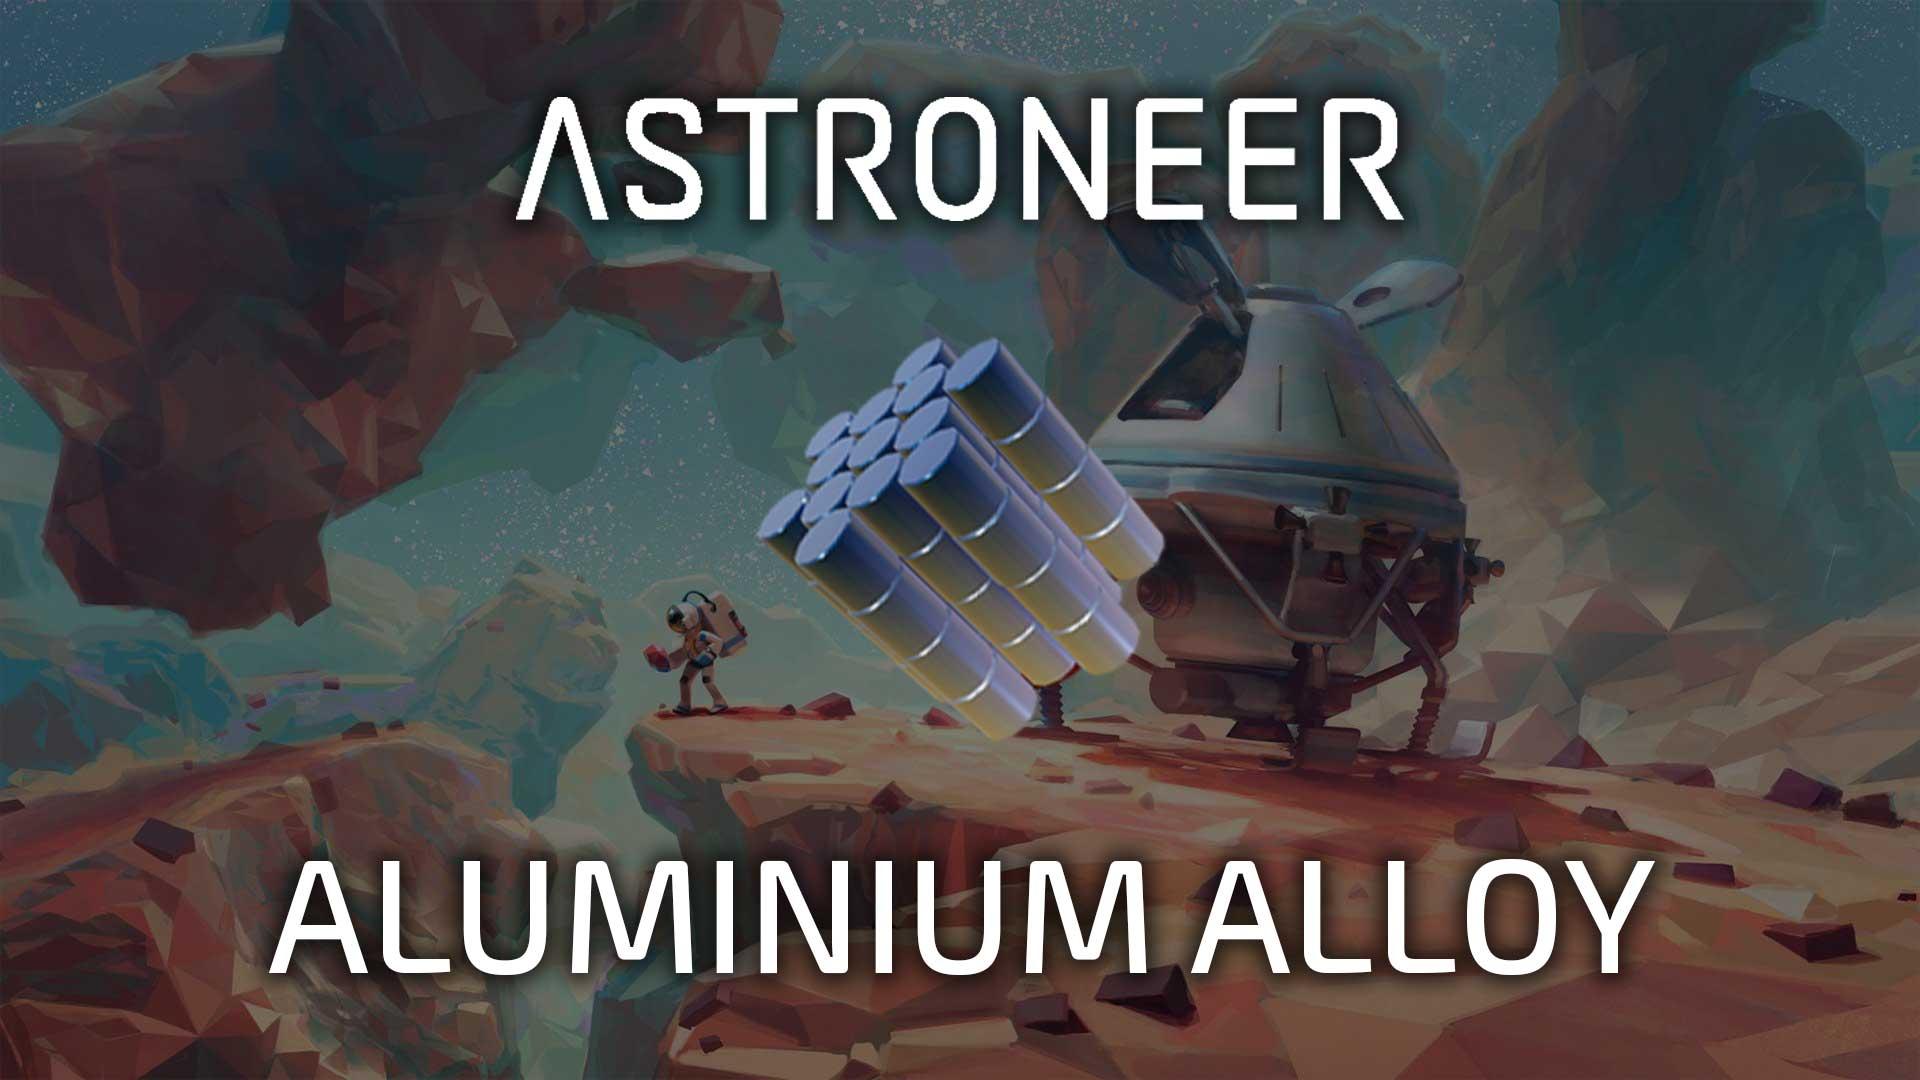 astroneer aluminium alloy